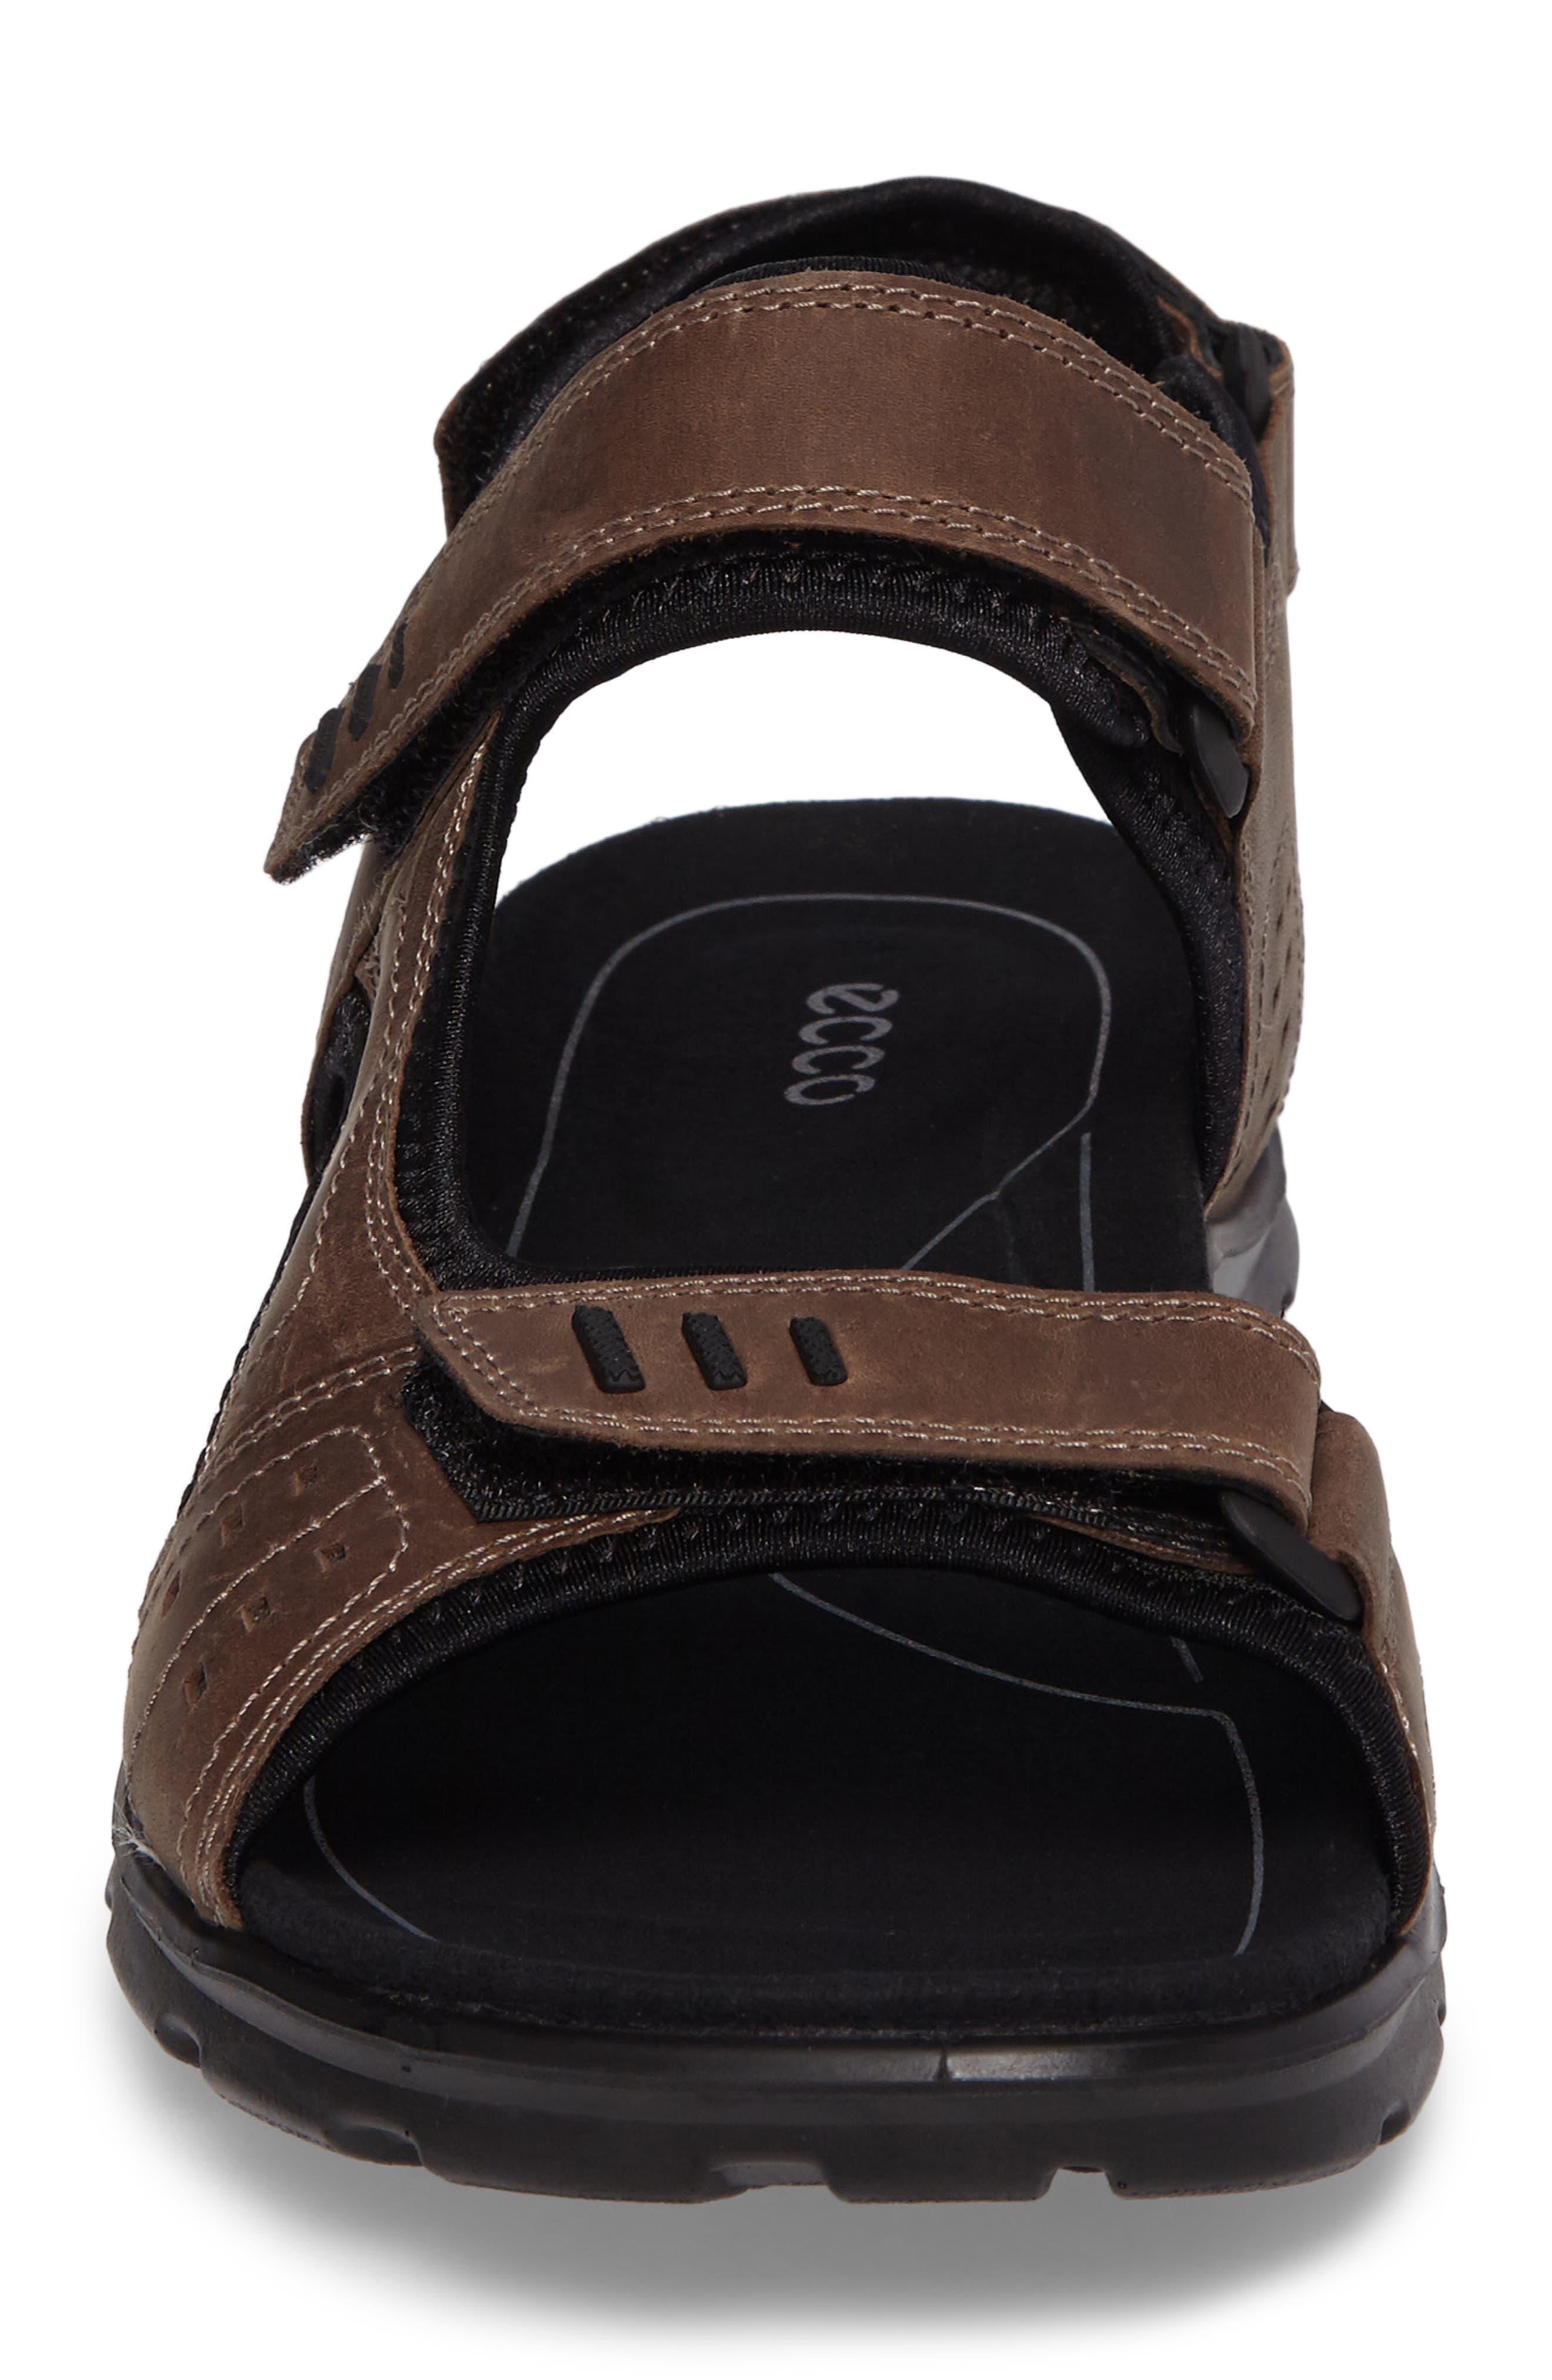 Utah Sandal,                             Alternate thumbnail 4, color,                             217